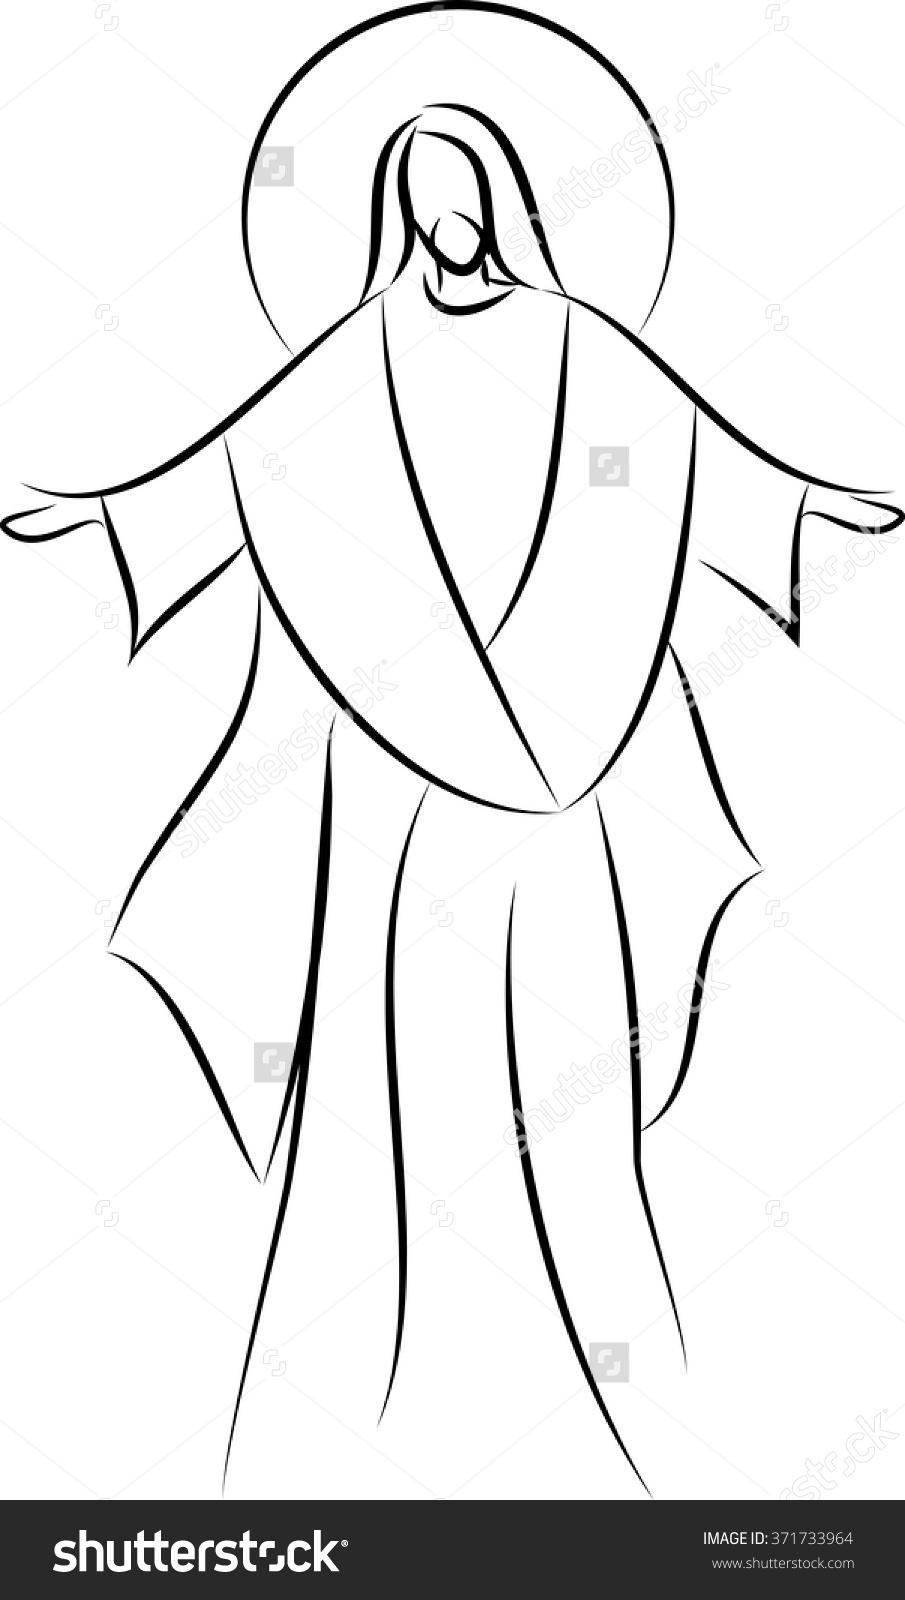 905x1600 Stock Vector Jesus Christ Simple Line Drawing Vector Illustration